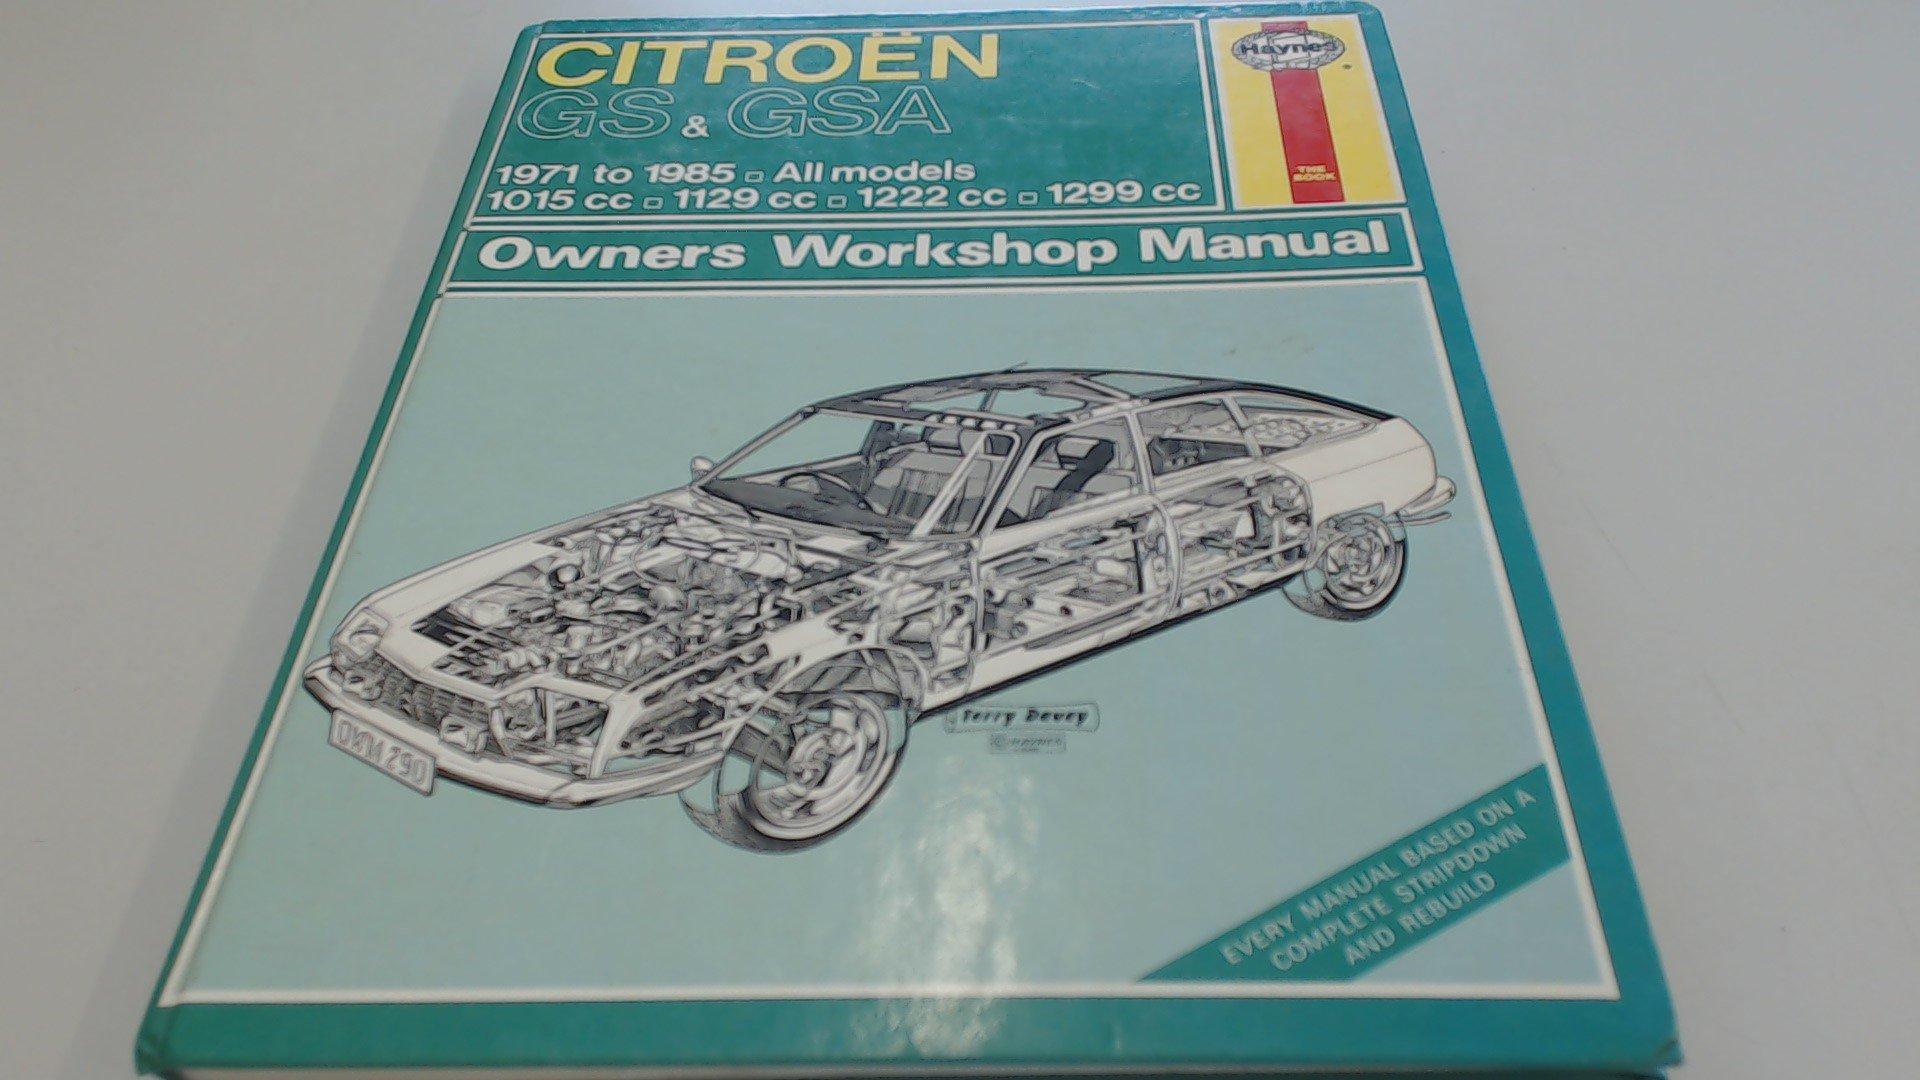 Citroen GS and GSA All Models 1971-85 Owner's Workshop Manual (Service &  repair manuals): Amazon.co.uk: J. H. Haynes, Bruce Gilmour: 9781850101635:  Books